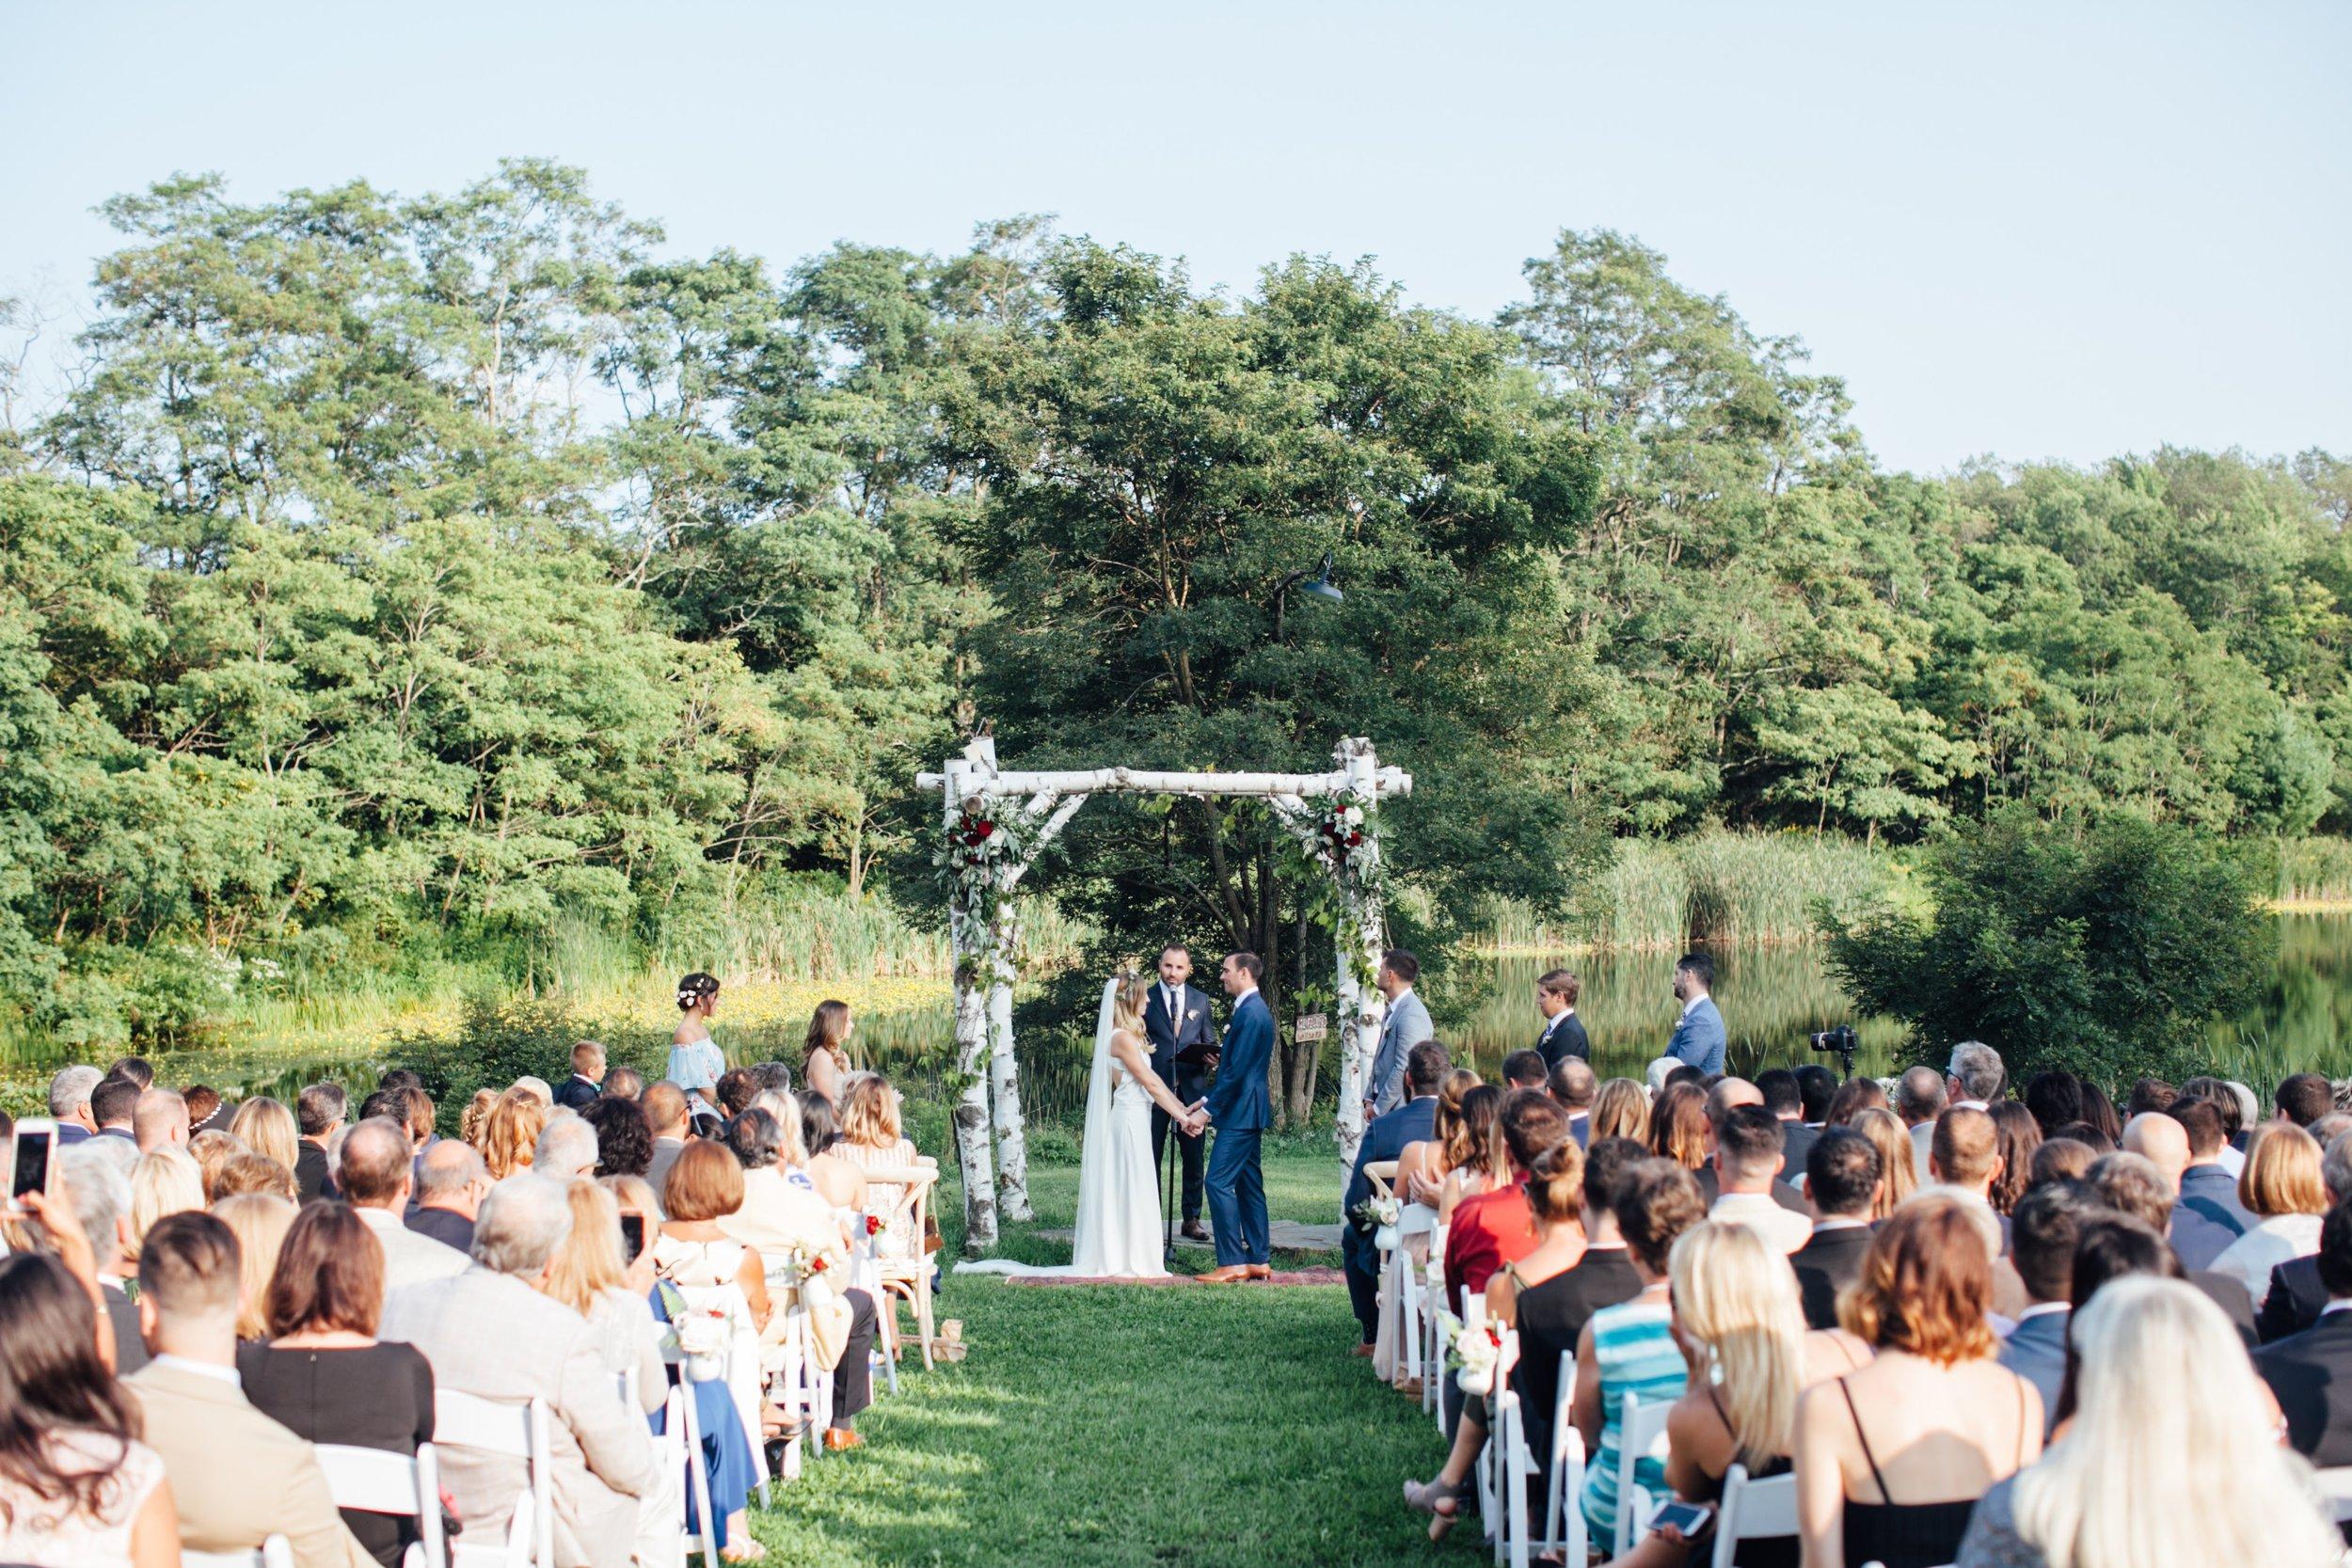 Courtney + Matt Blenheim Hill Farm Catskills NY Wedding Veronica Lola Photography 2017-421.jpg